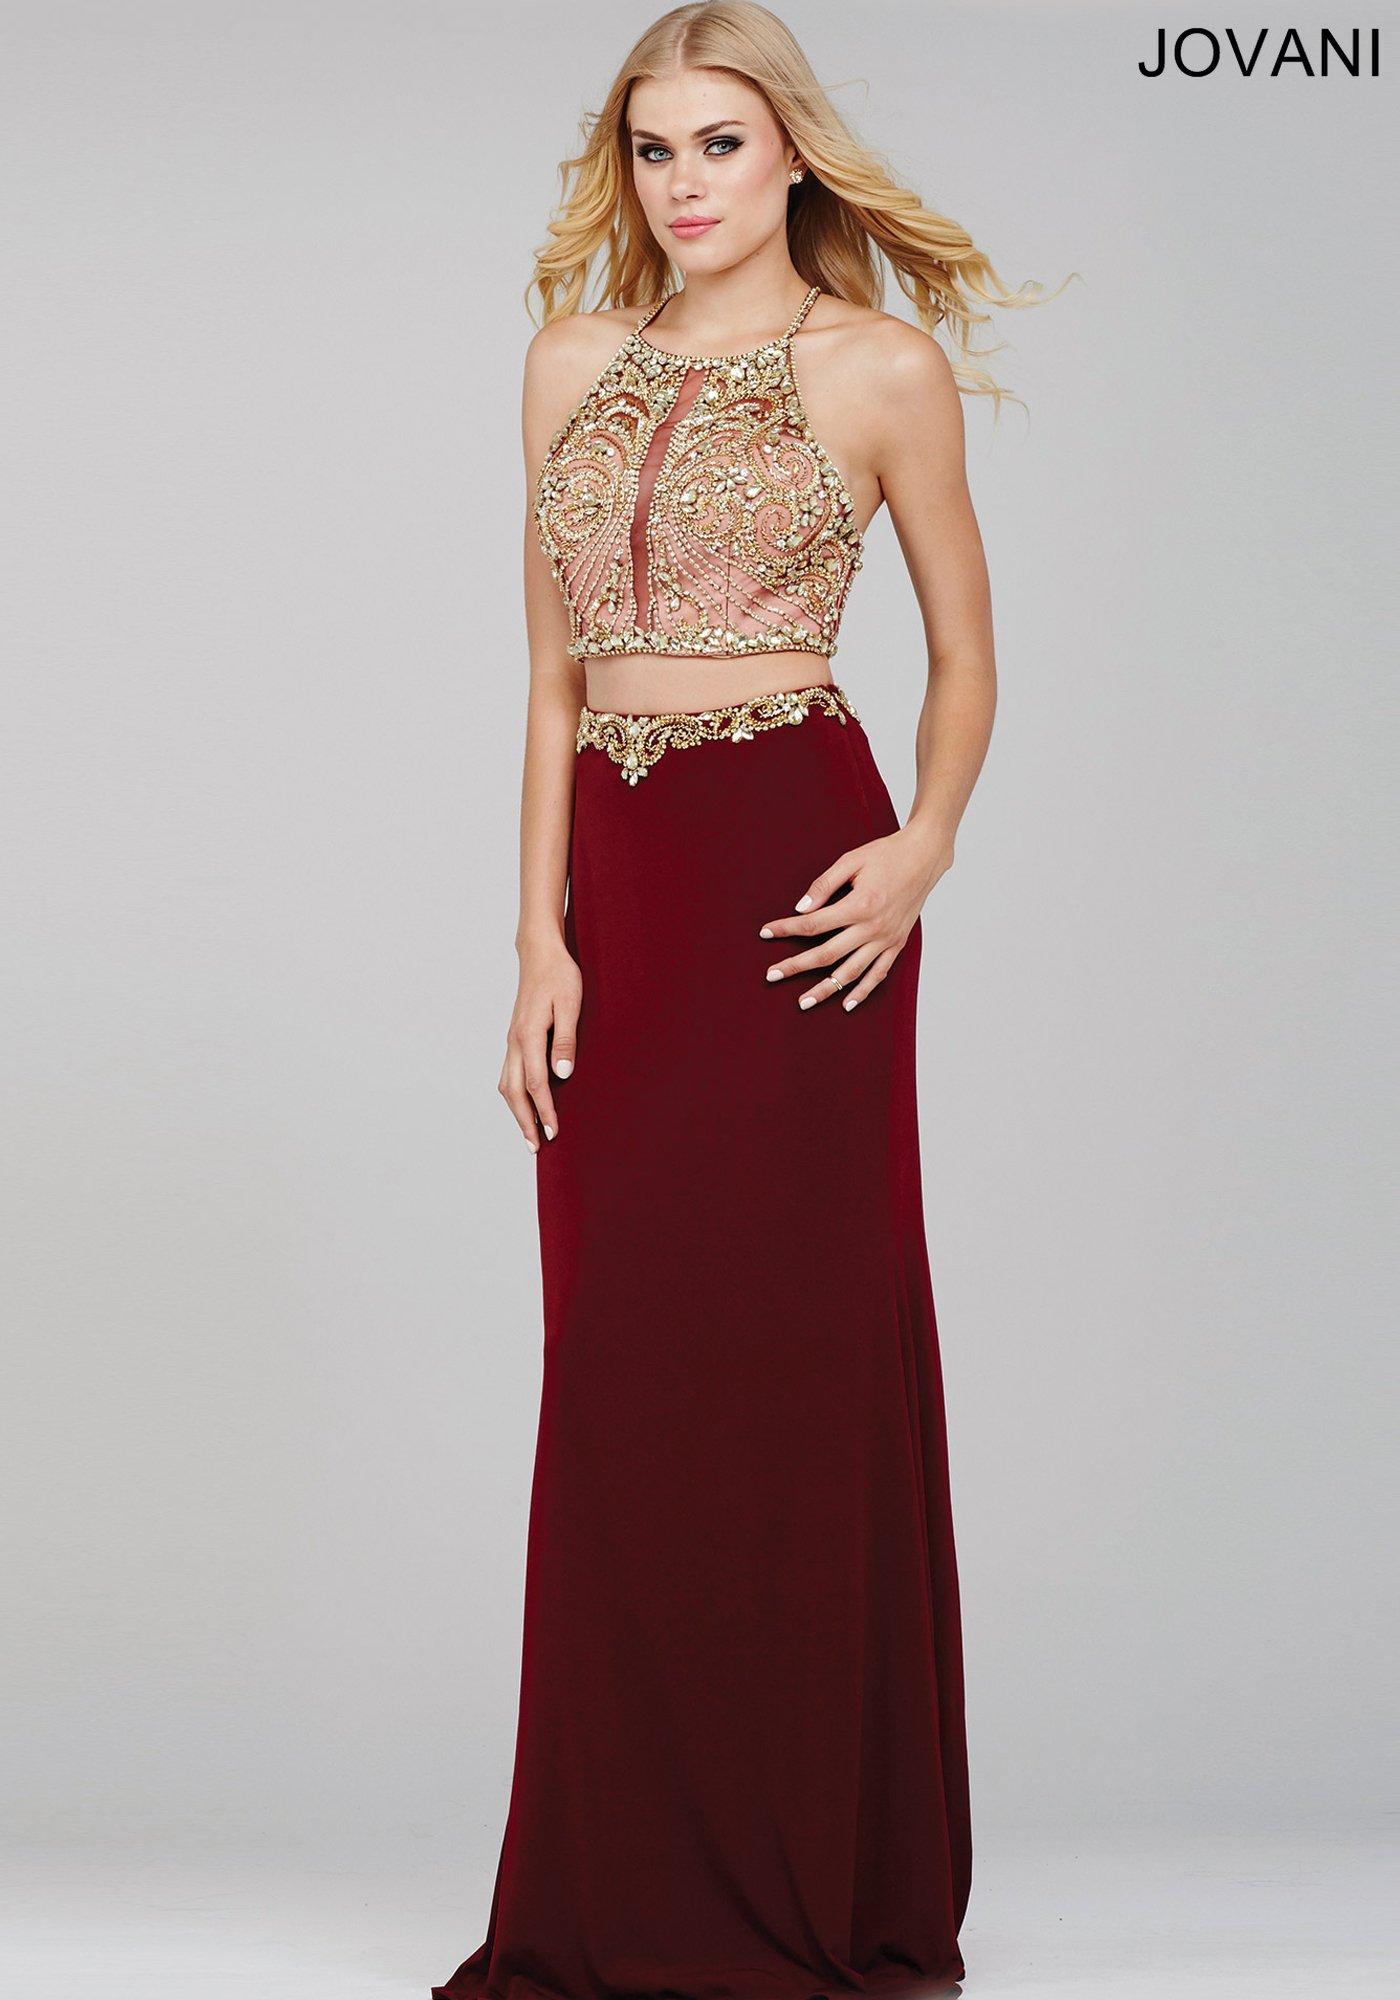 Burgundy Two-Piece Halter Dress - Play Dress Up